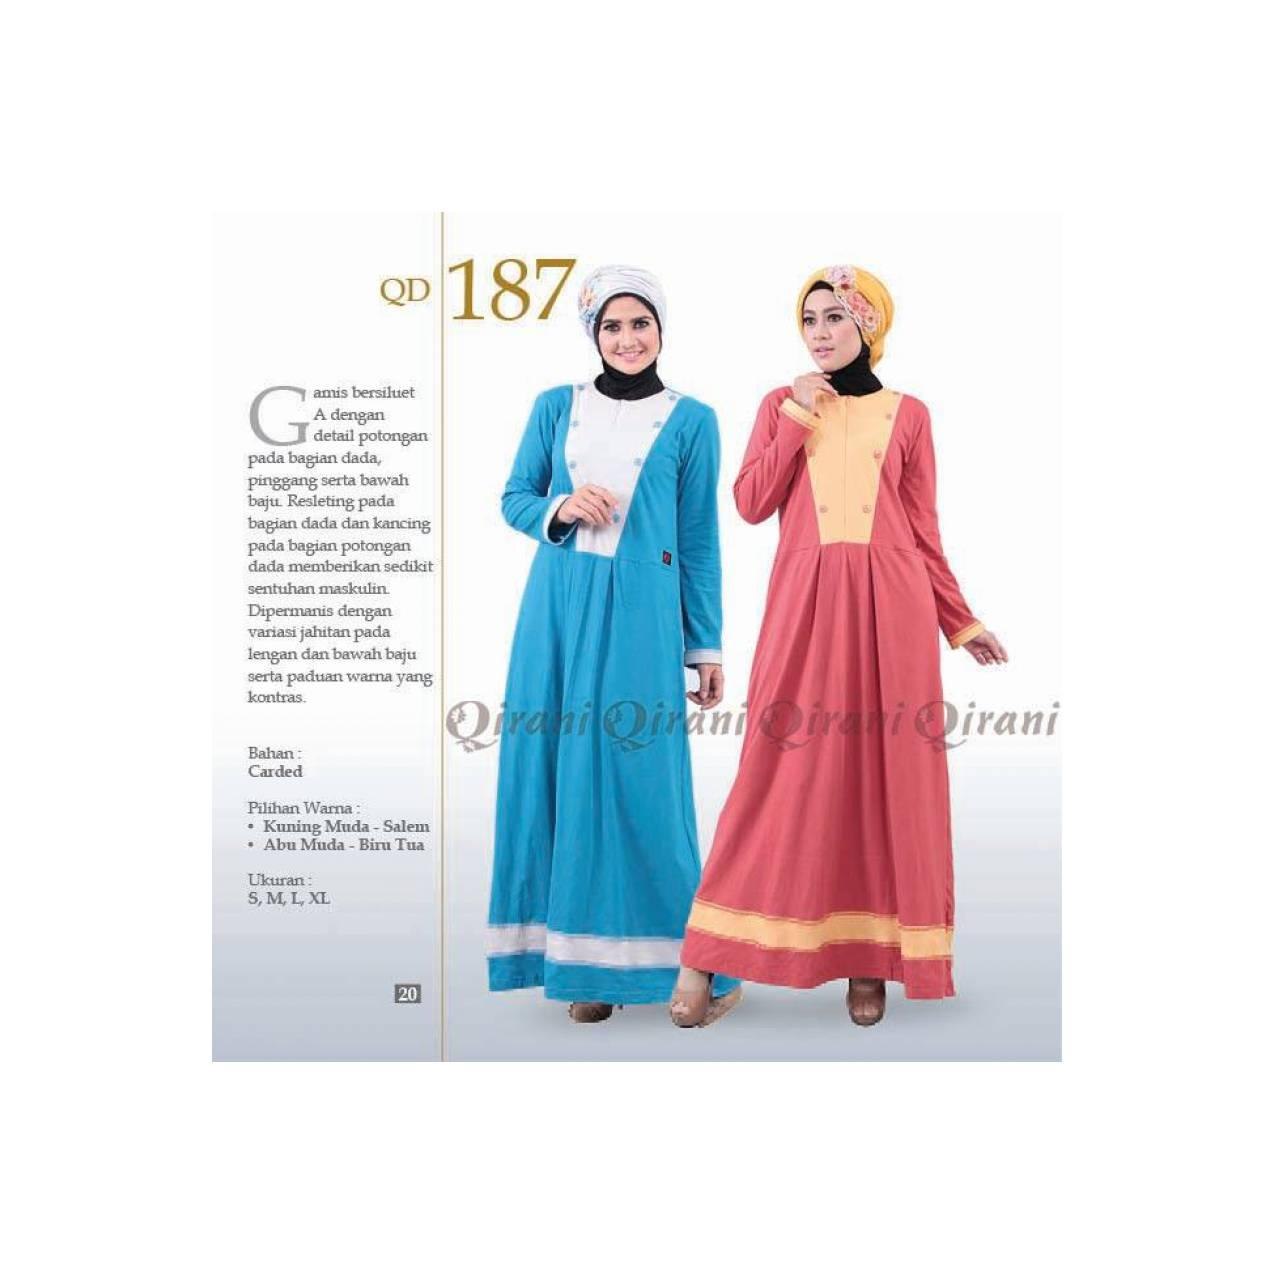 Baju Muslimah Gamis Murah Bahan Kaos QIRANI QD - 187